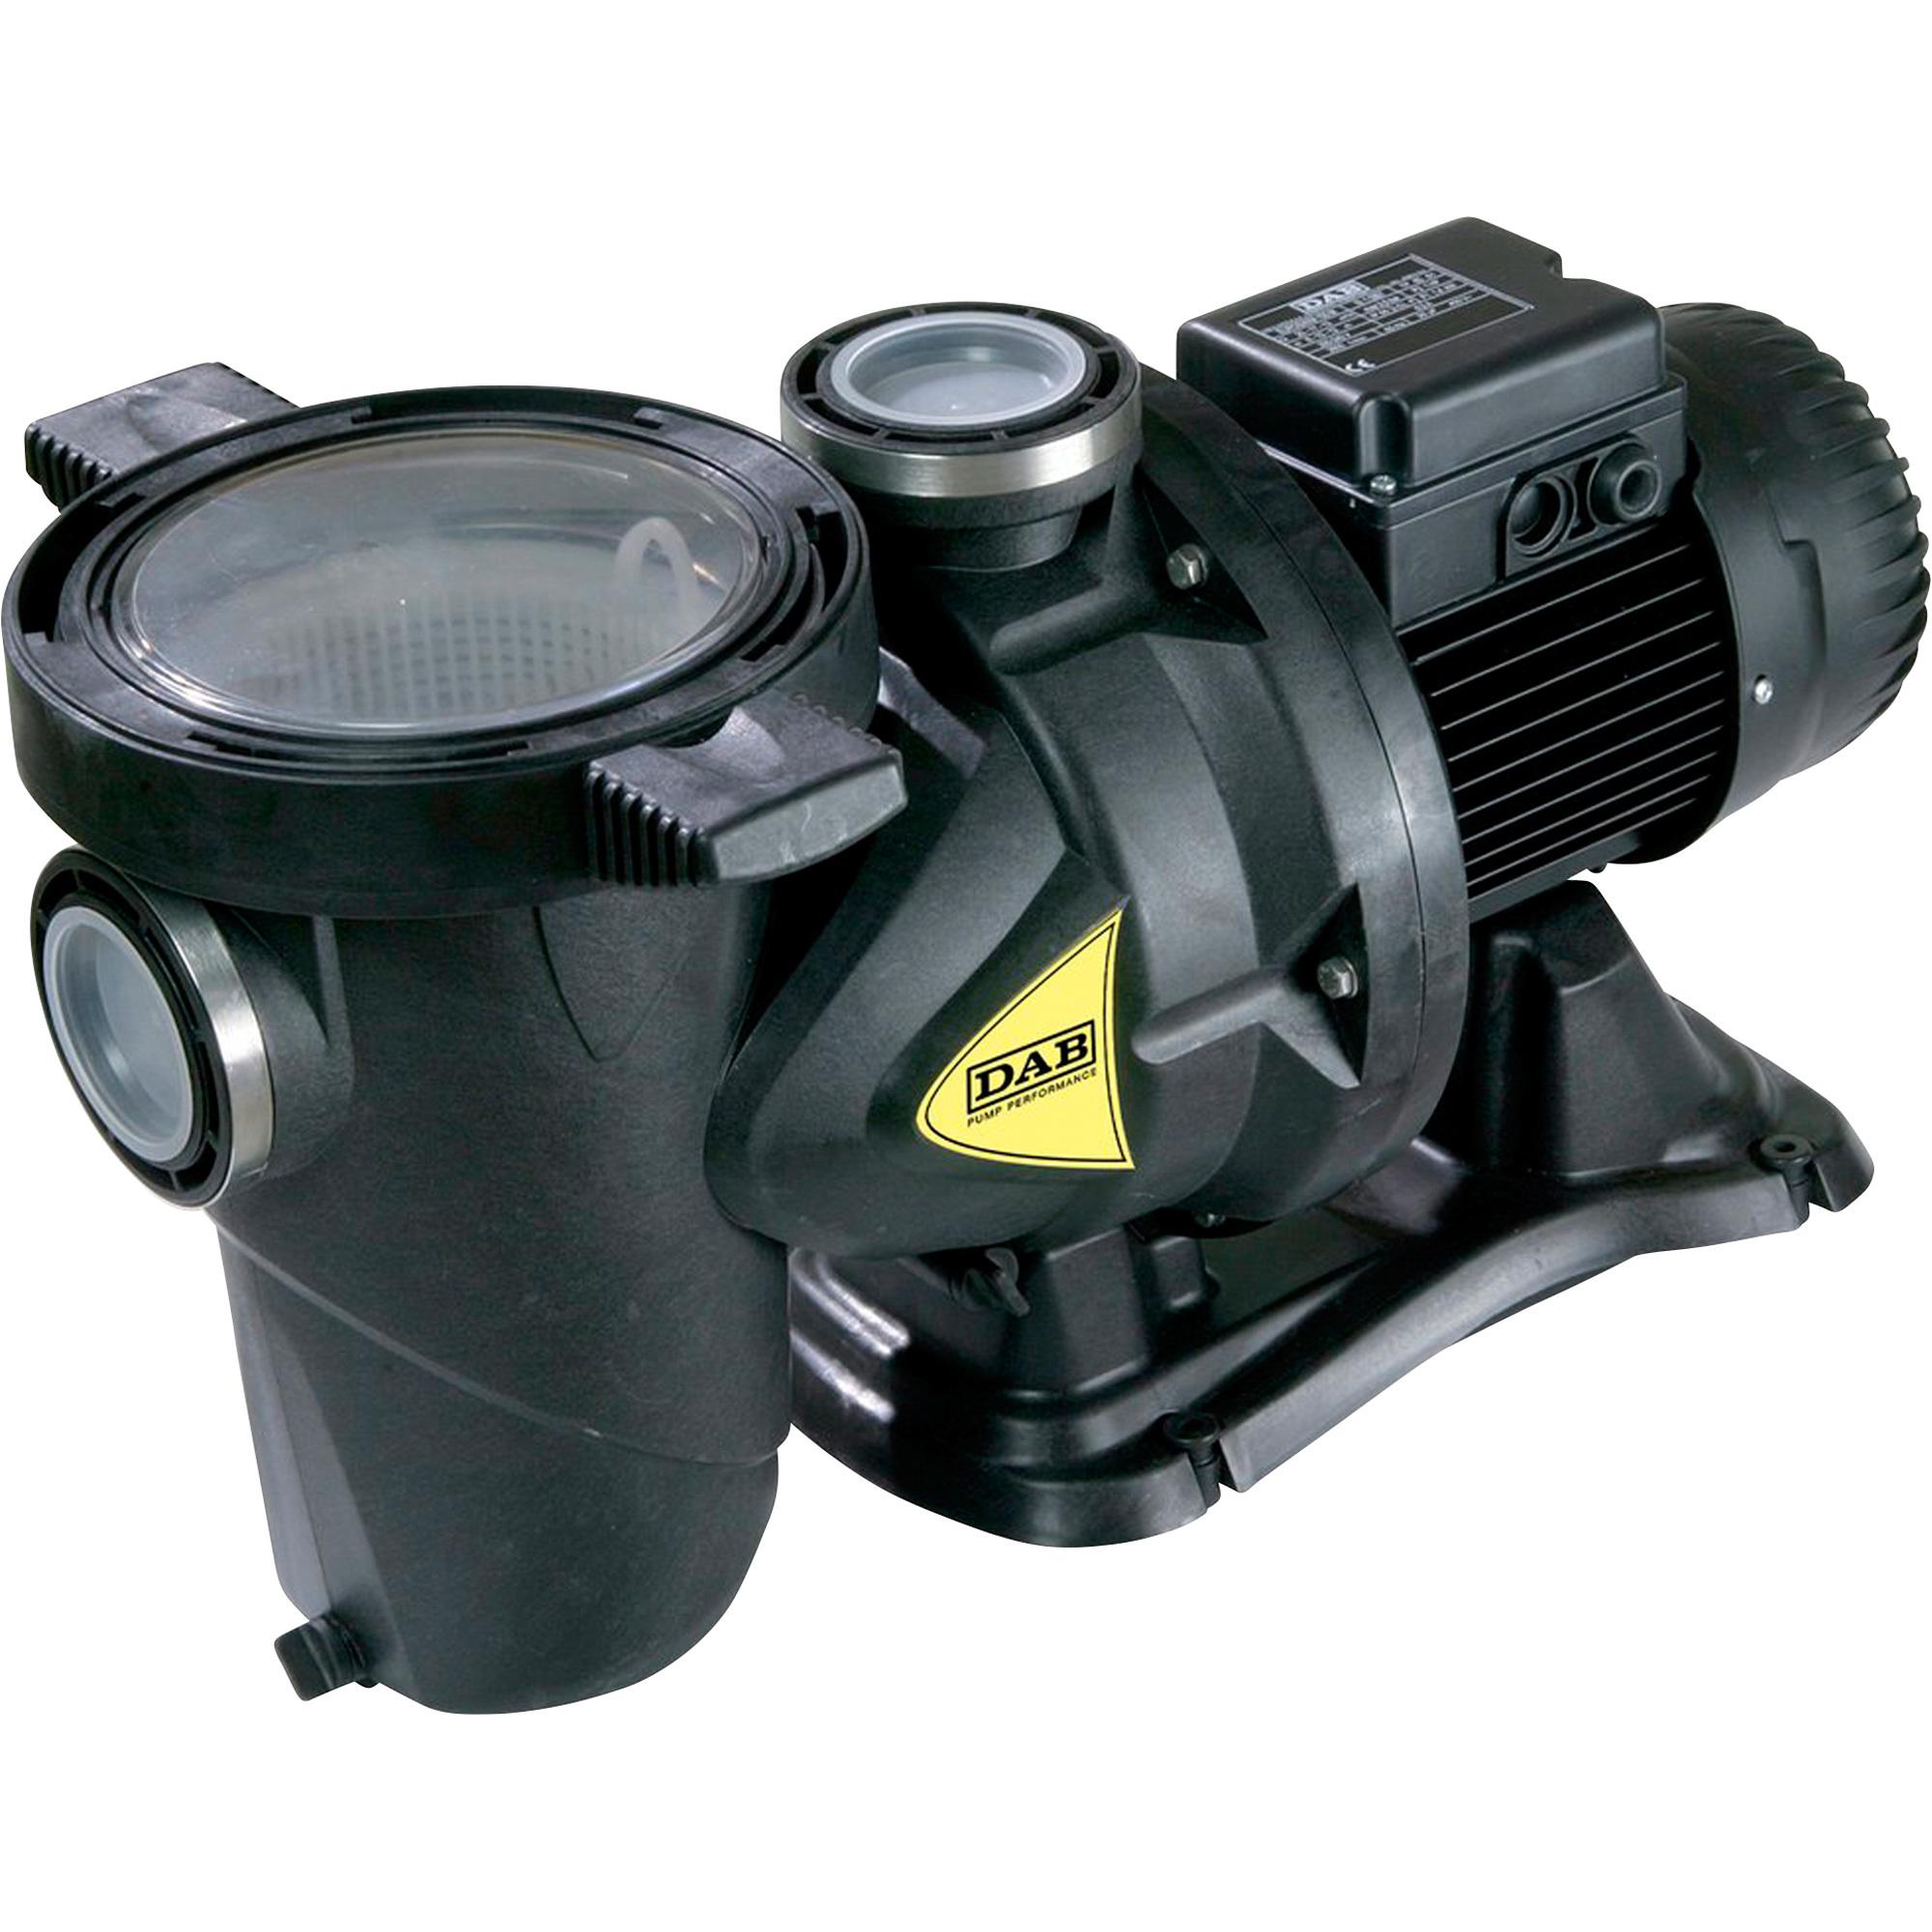 EUROSWIM 150 Electronic Swimming Pool Pump- 6840 GPH - 1.5 HP - 230V